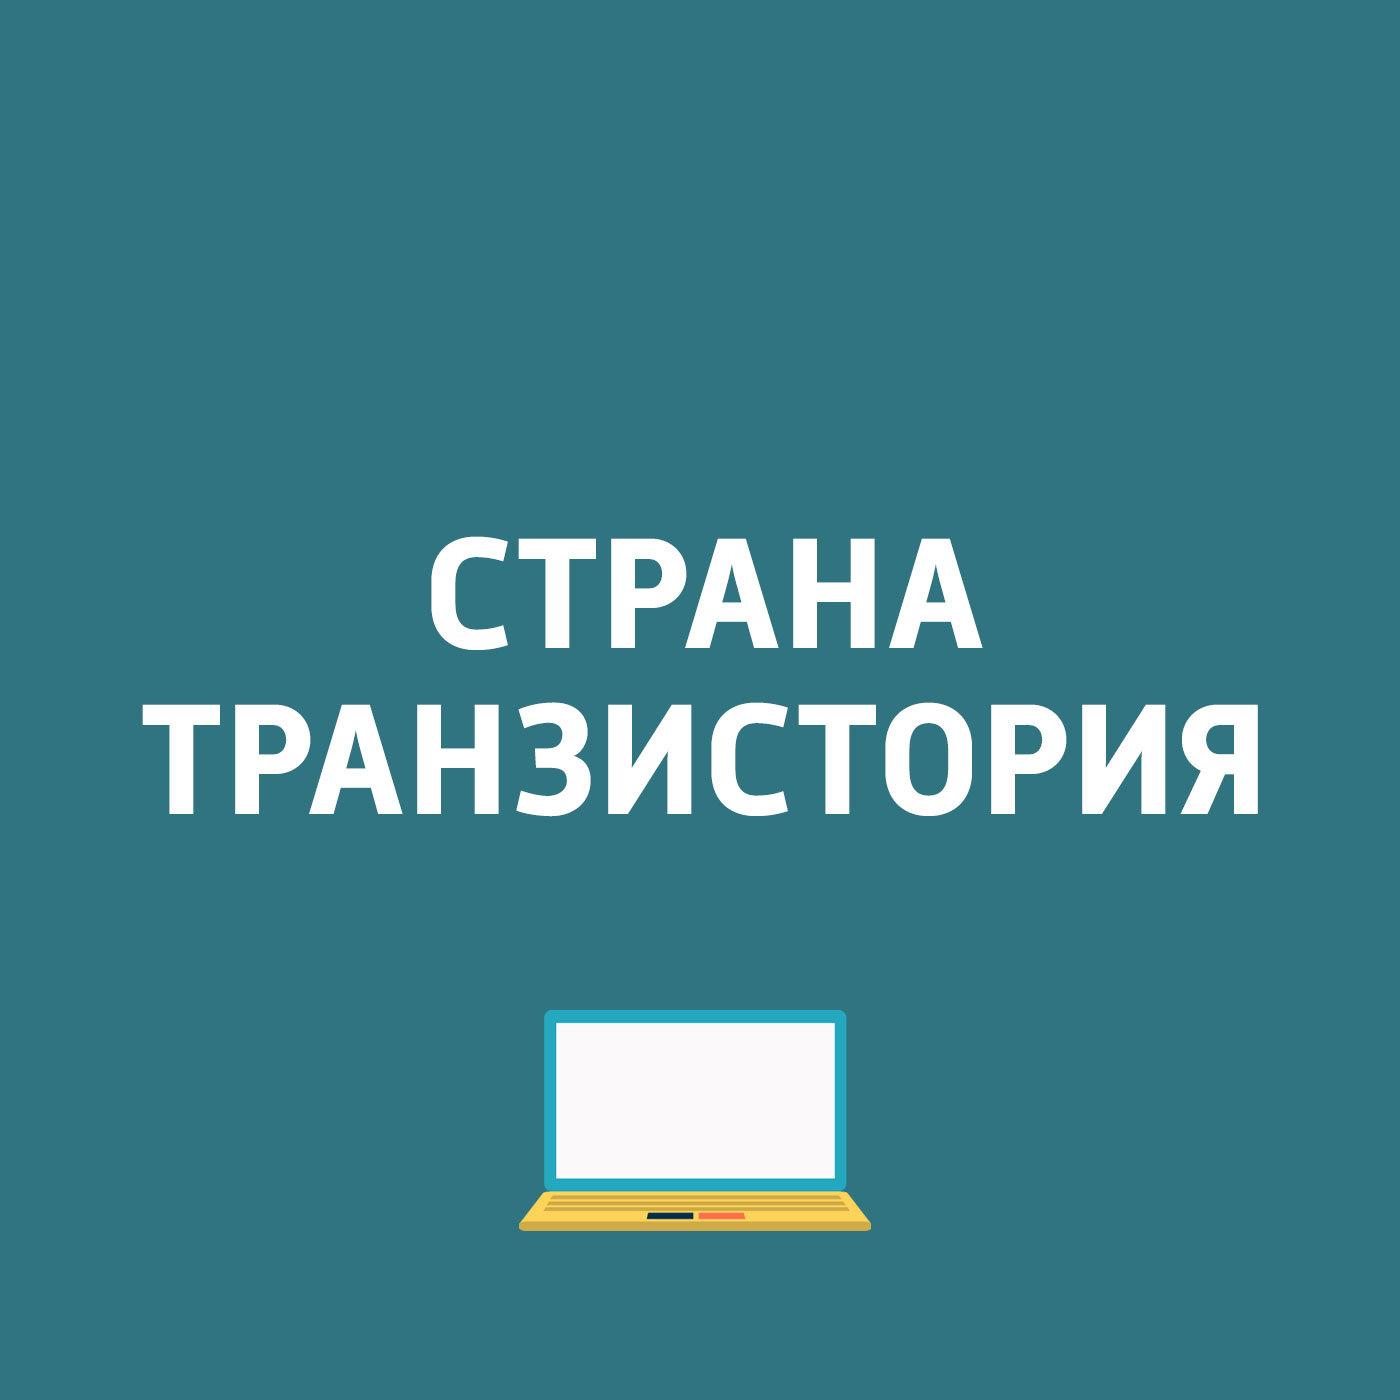 Картаев Павел Galaxy A9, Яндекс.Панорамы, видеозвонки в WhatsApp ori and the blind forest definitive edition [pc цифровая версия] цифровая версия